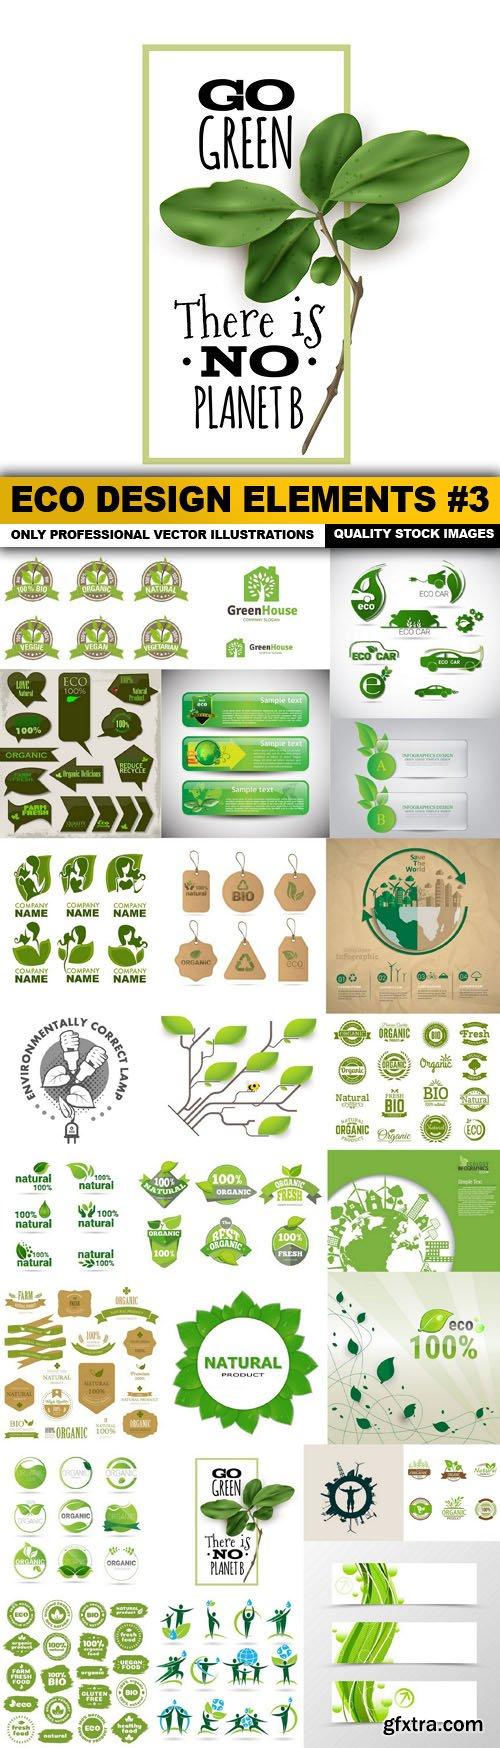 ECO Design Elements #3 - 25 Vector